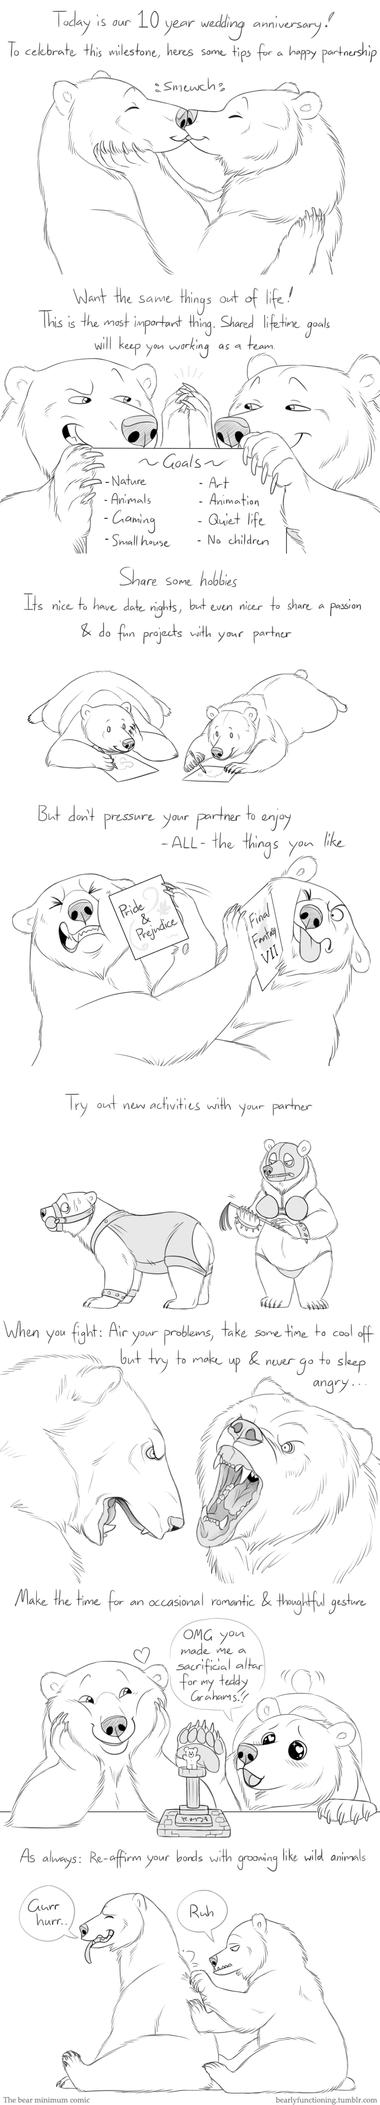 10 happy years by Bear-hybrid